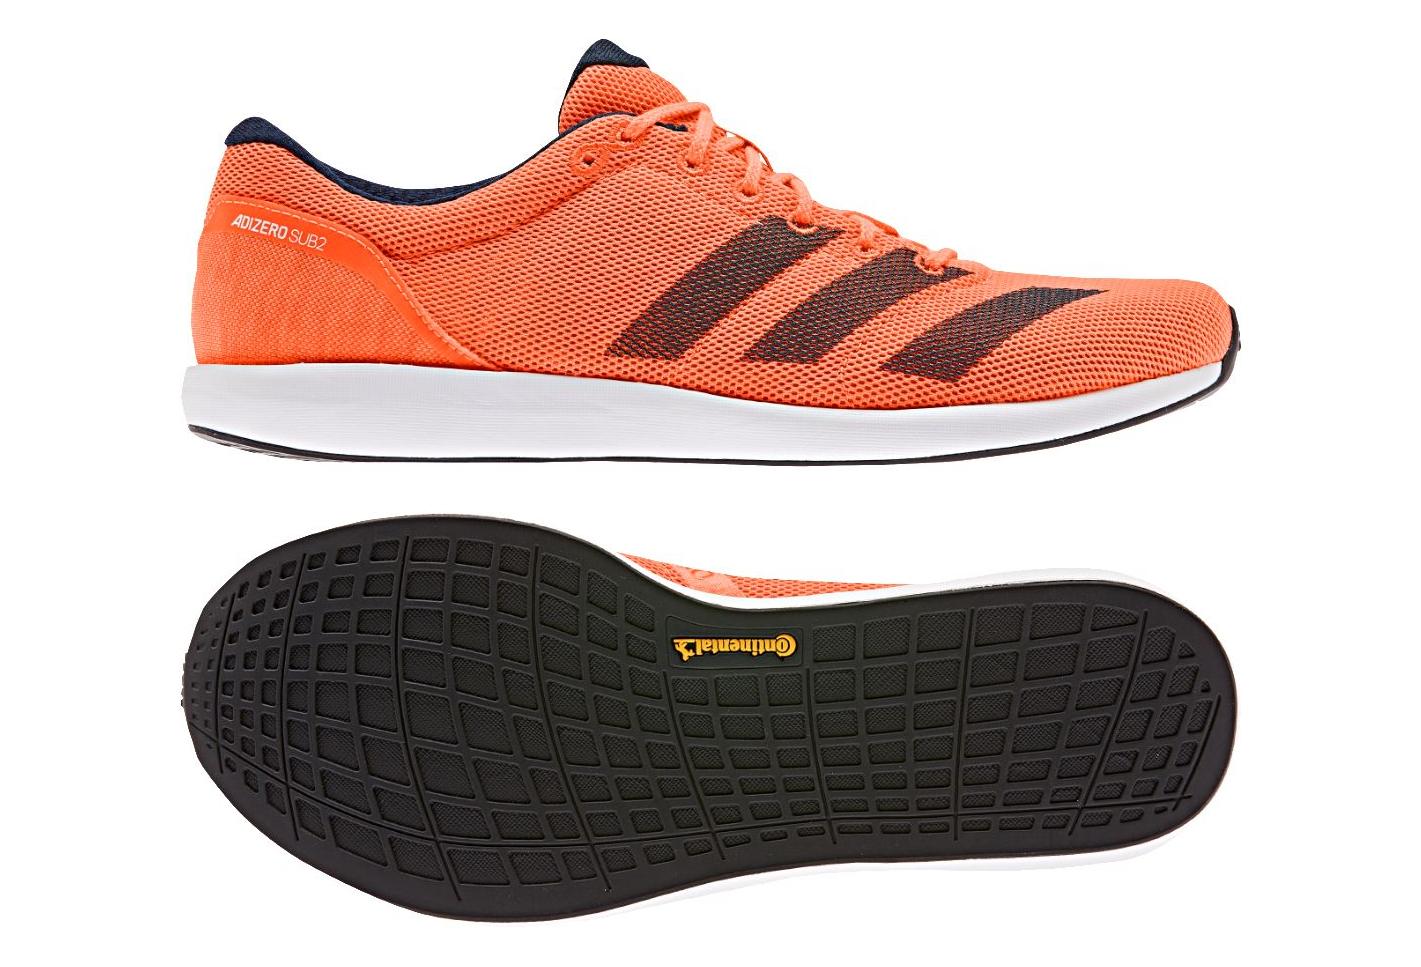 Adular préstamo Mar  adidas adizero orange Online Shopping for Women, Men, Kids Fashion &  Lifestyle|Free Delivery & Returns! -